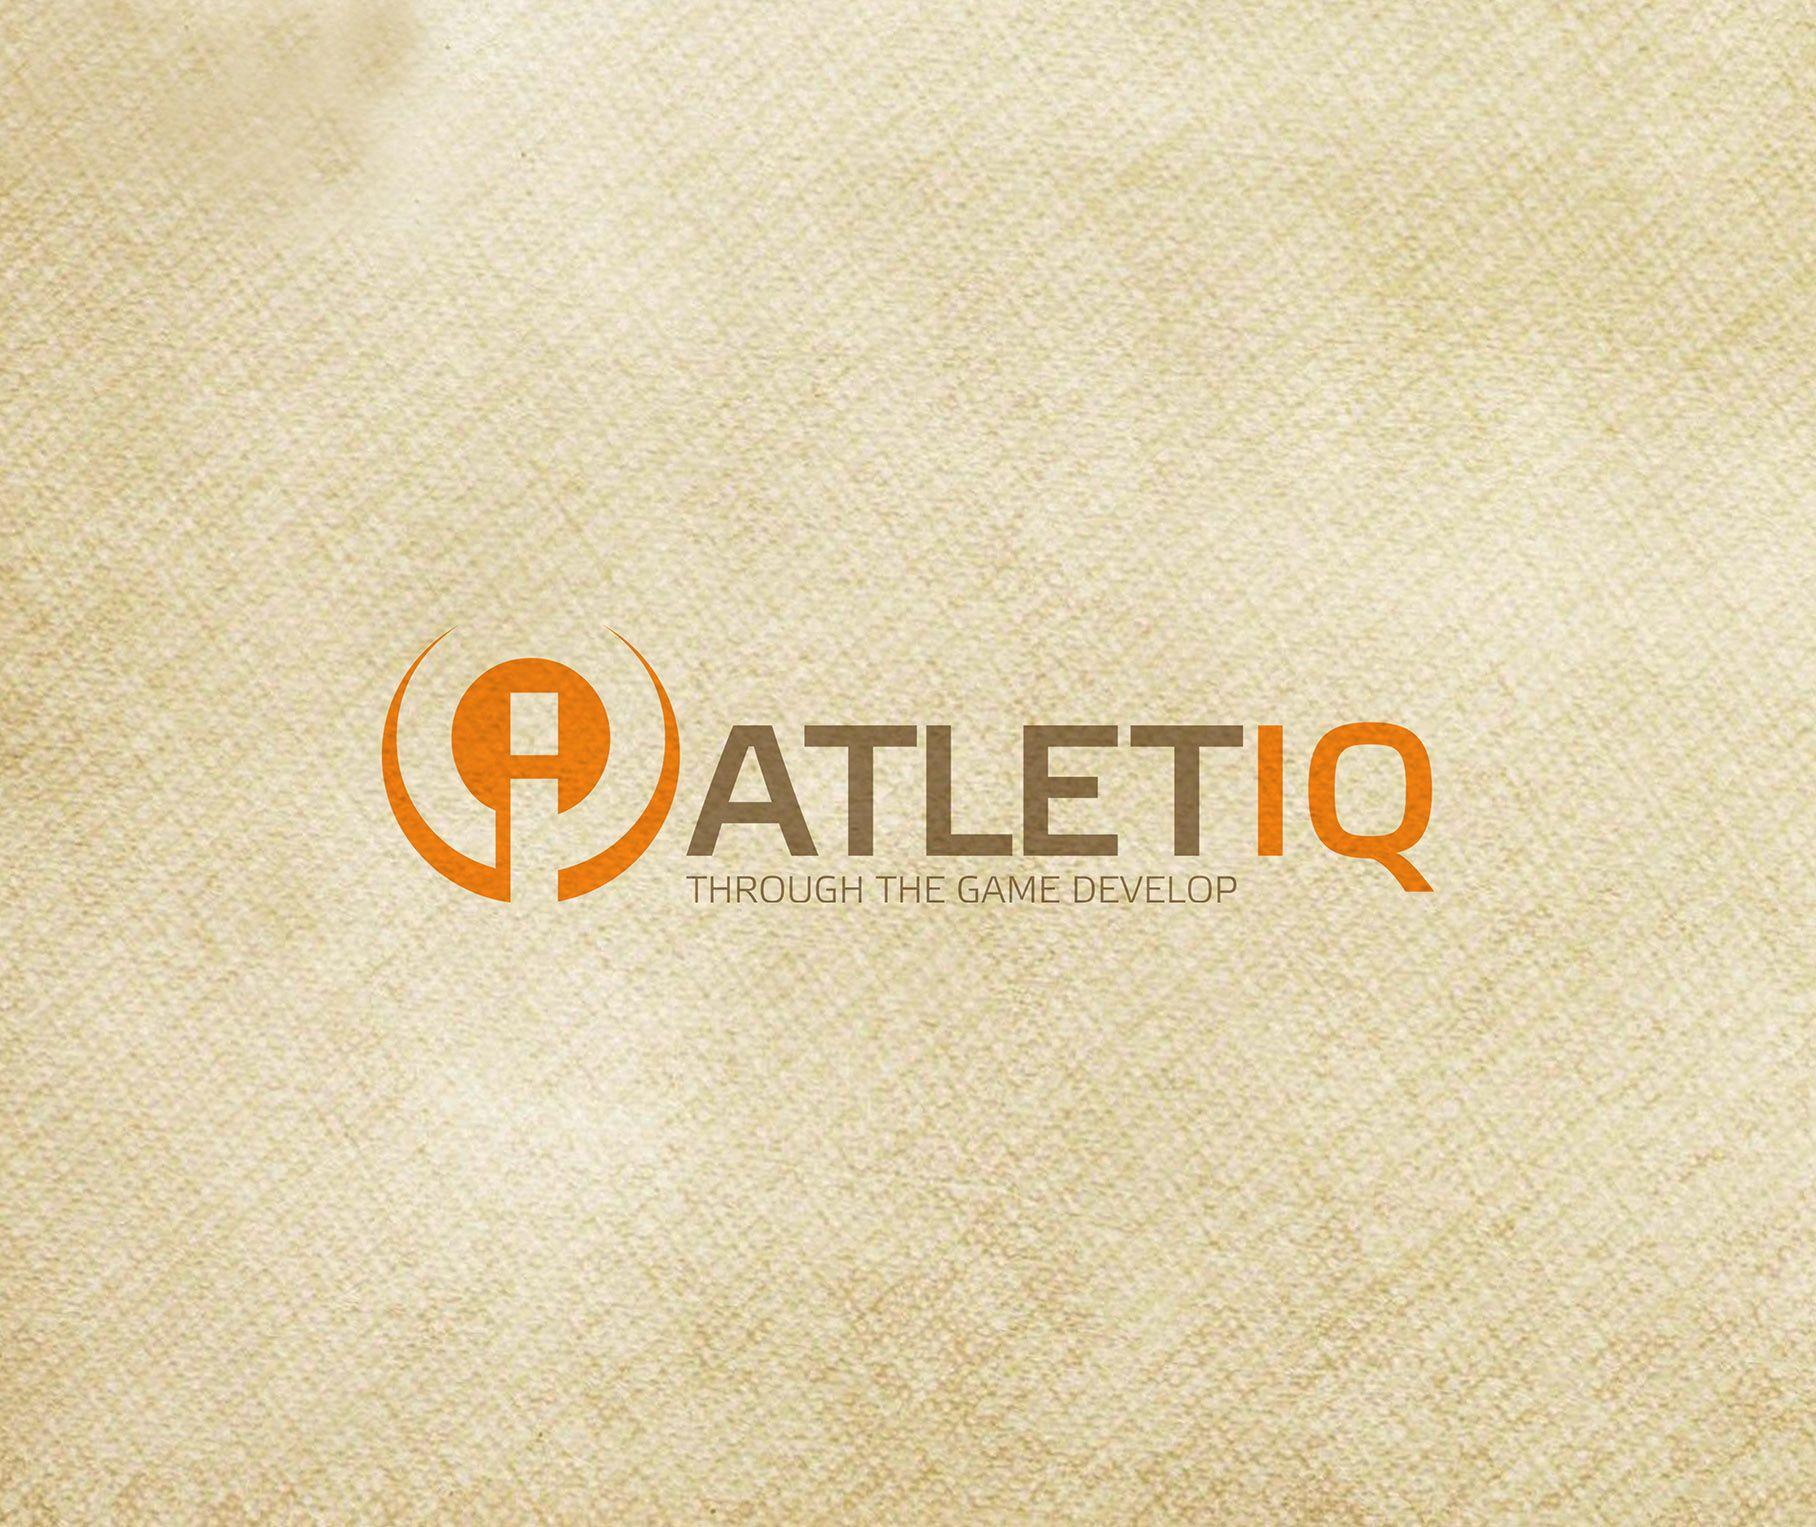 Логотип для спортивного сервиса Atletiq - дизайнер cloudlixo